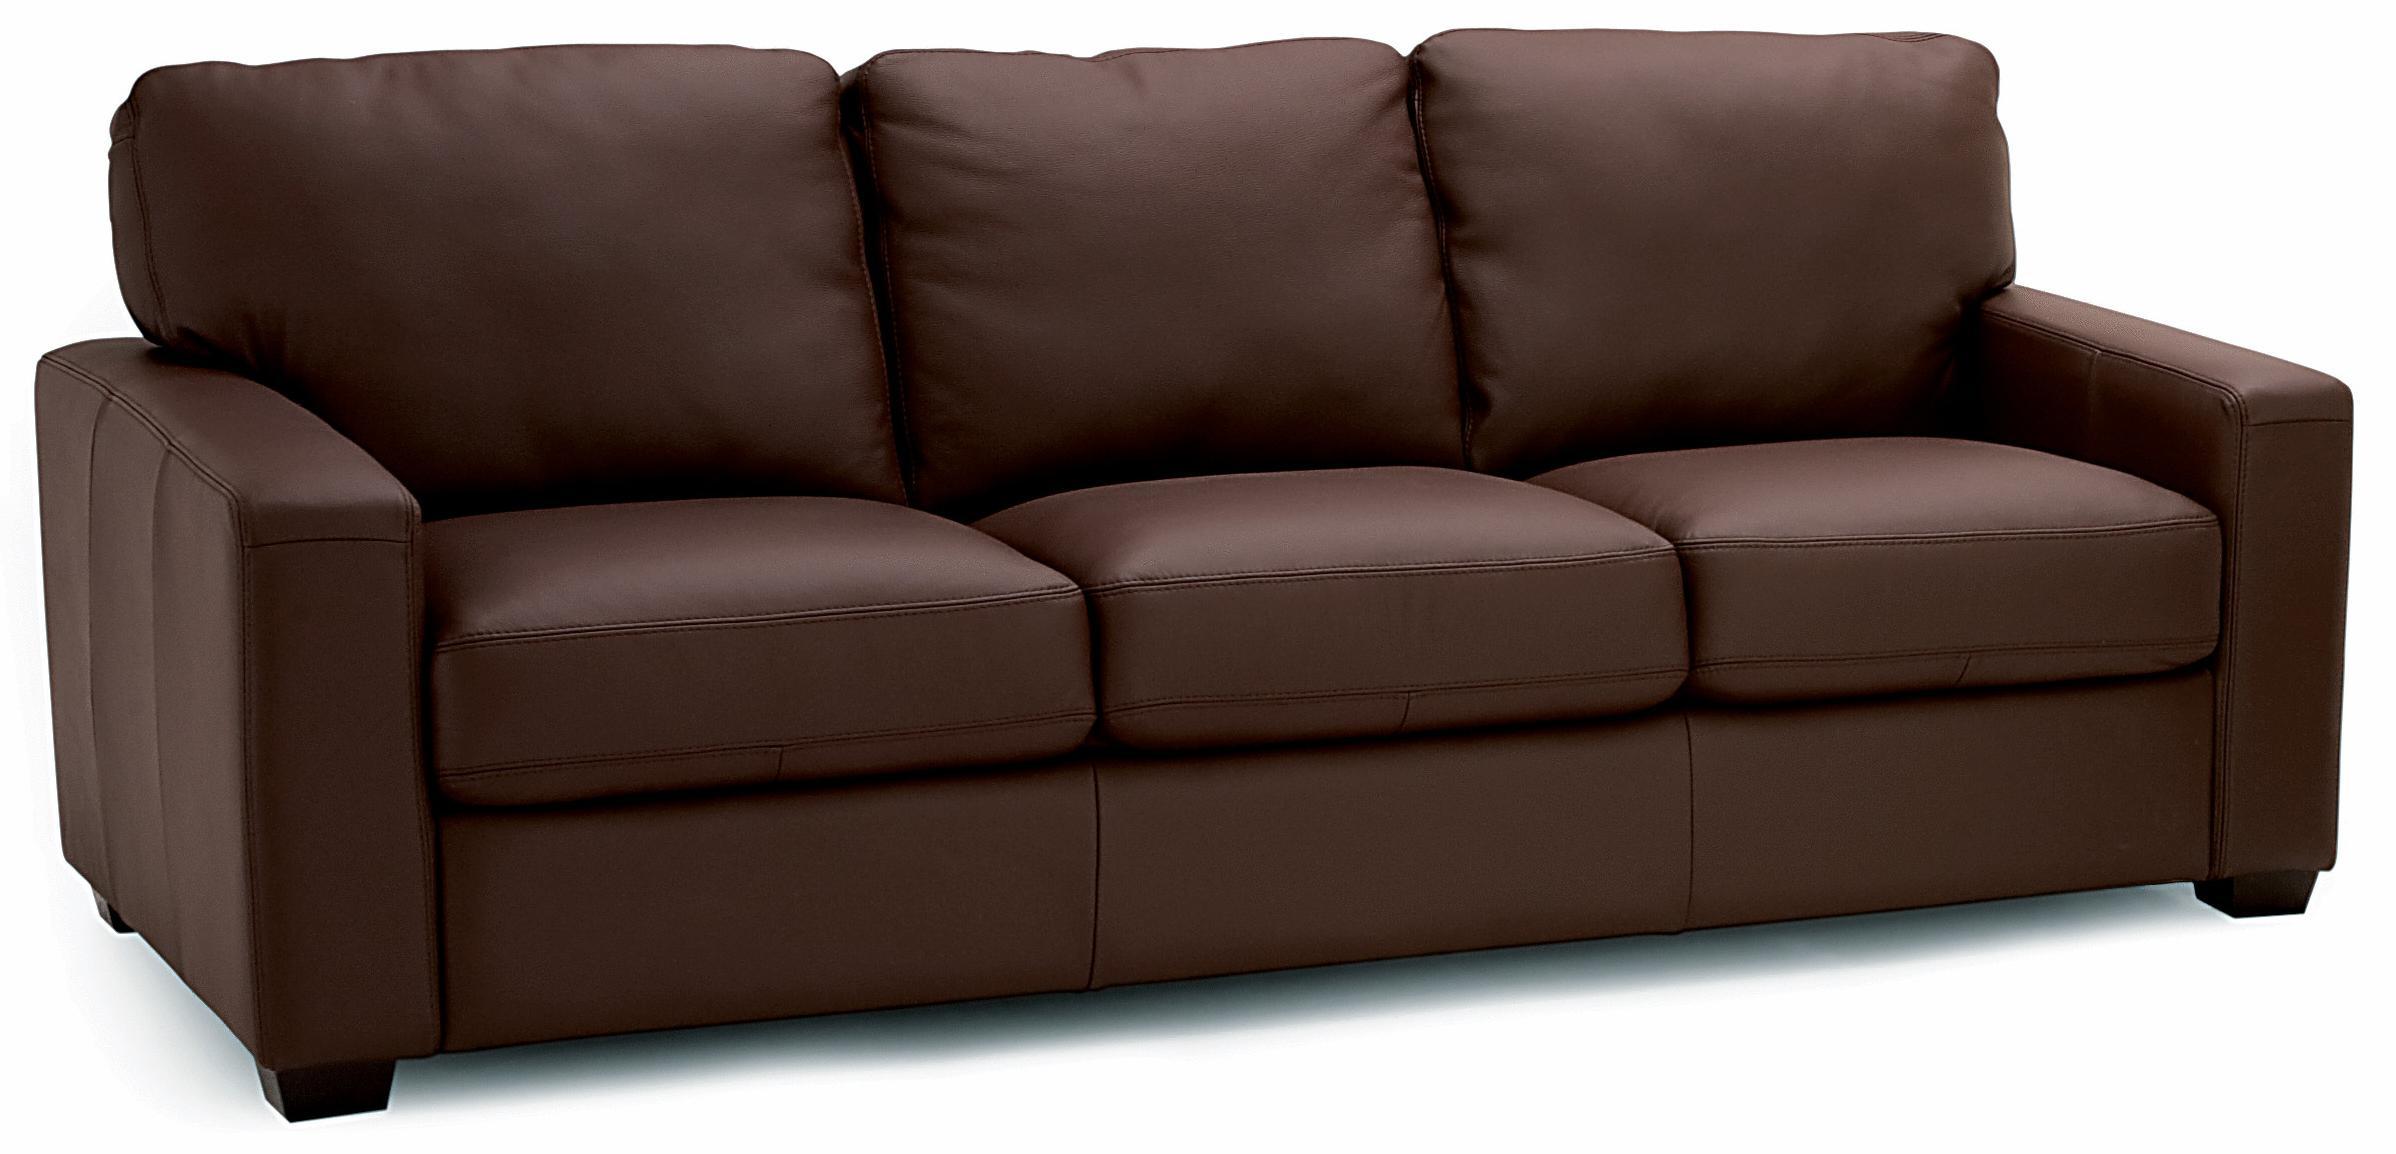 Palliser Westend Sofa - Item Number: 77322-01